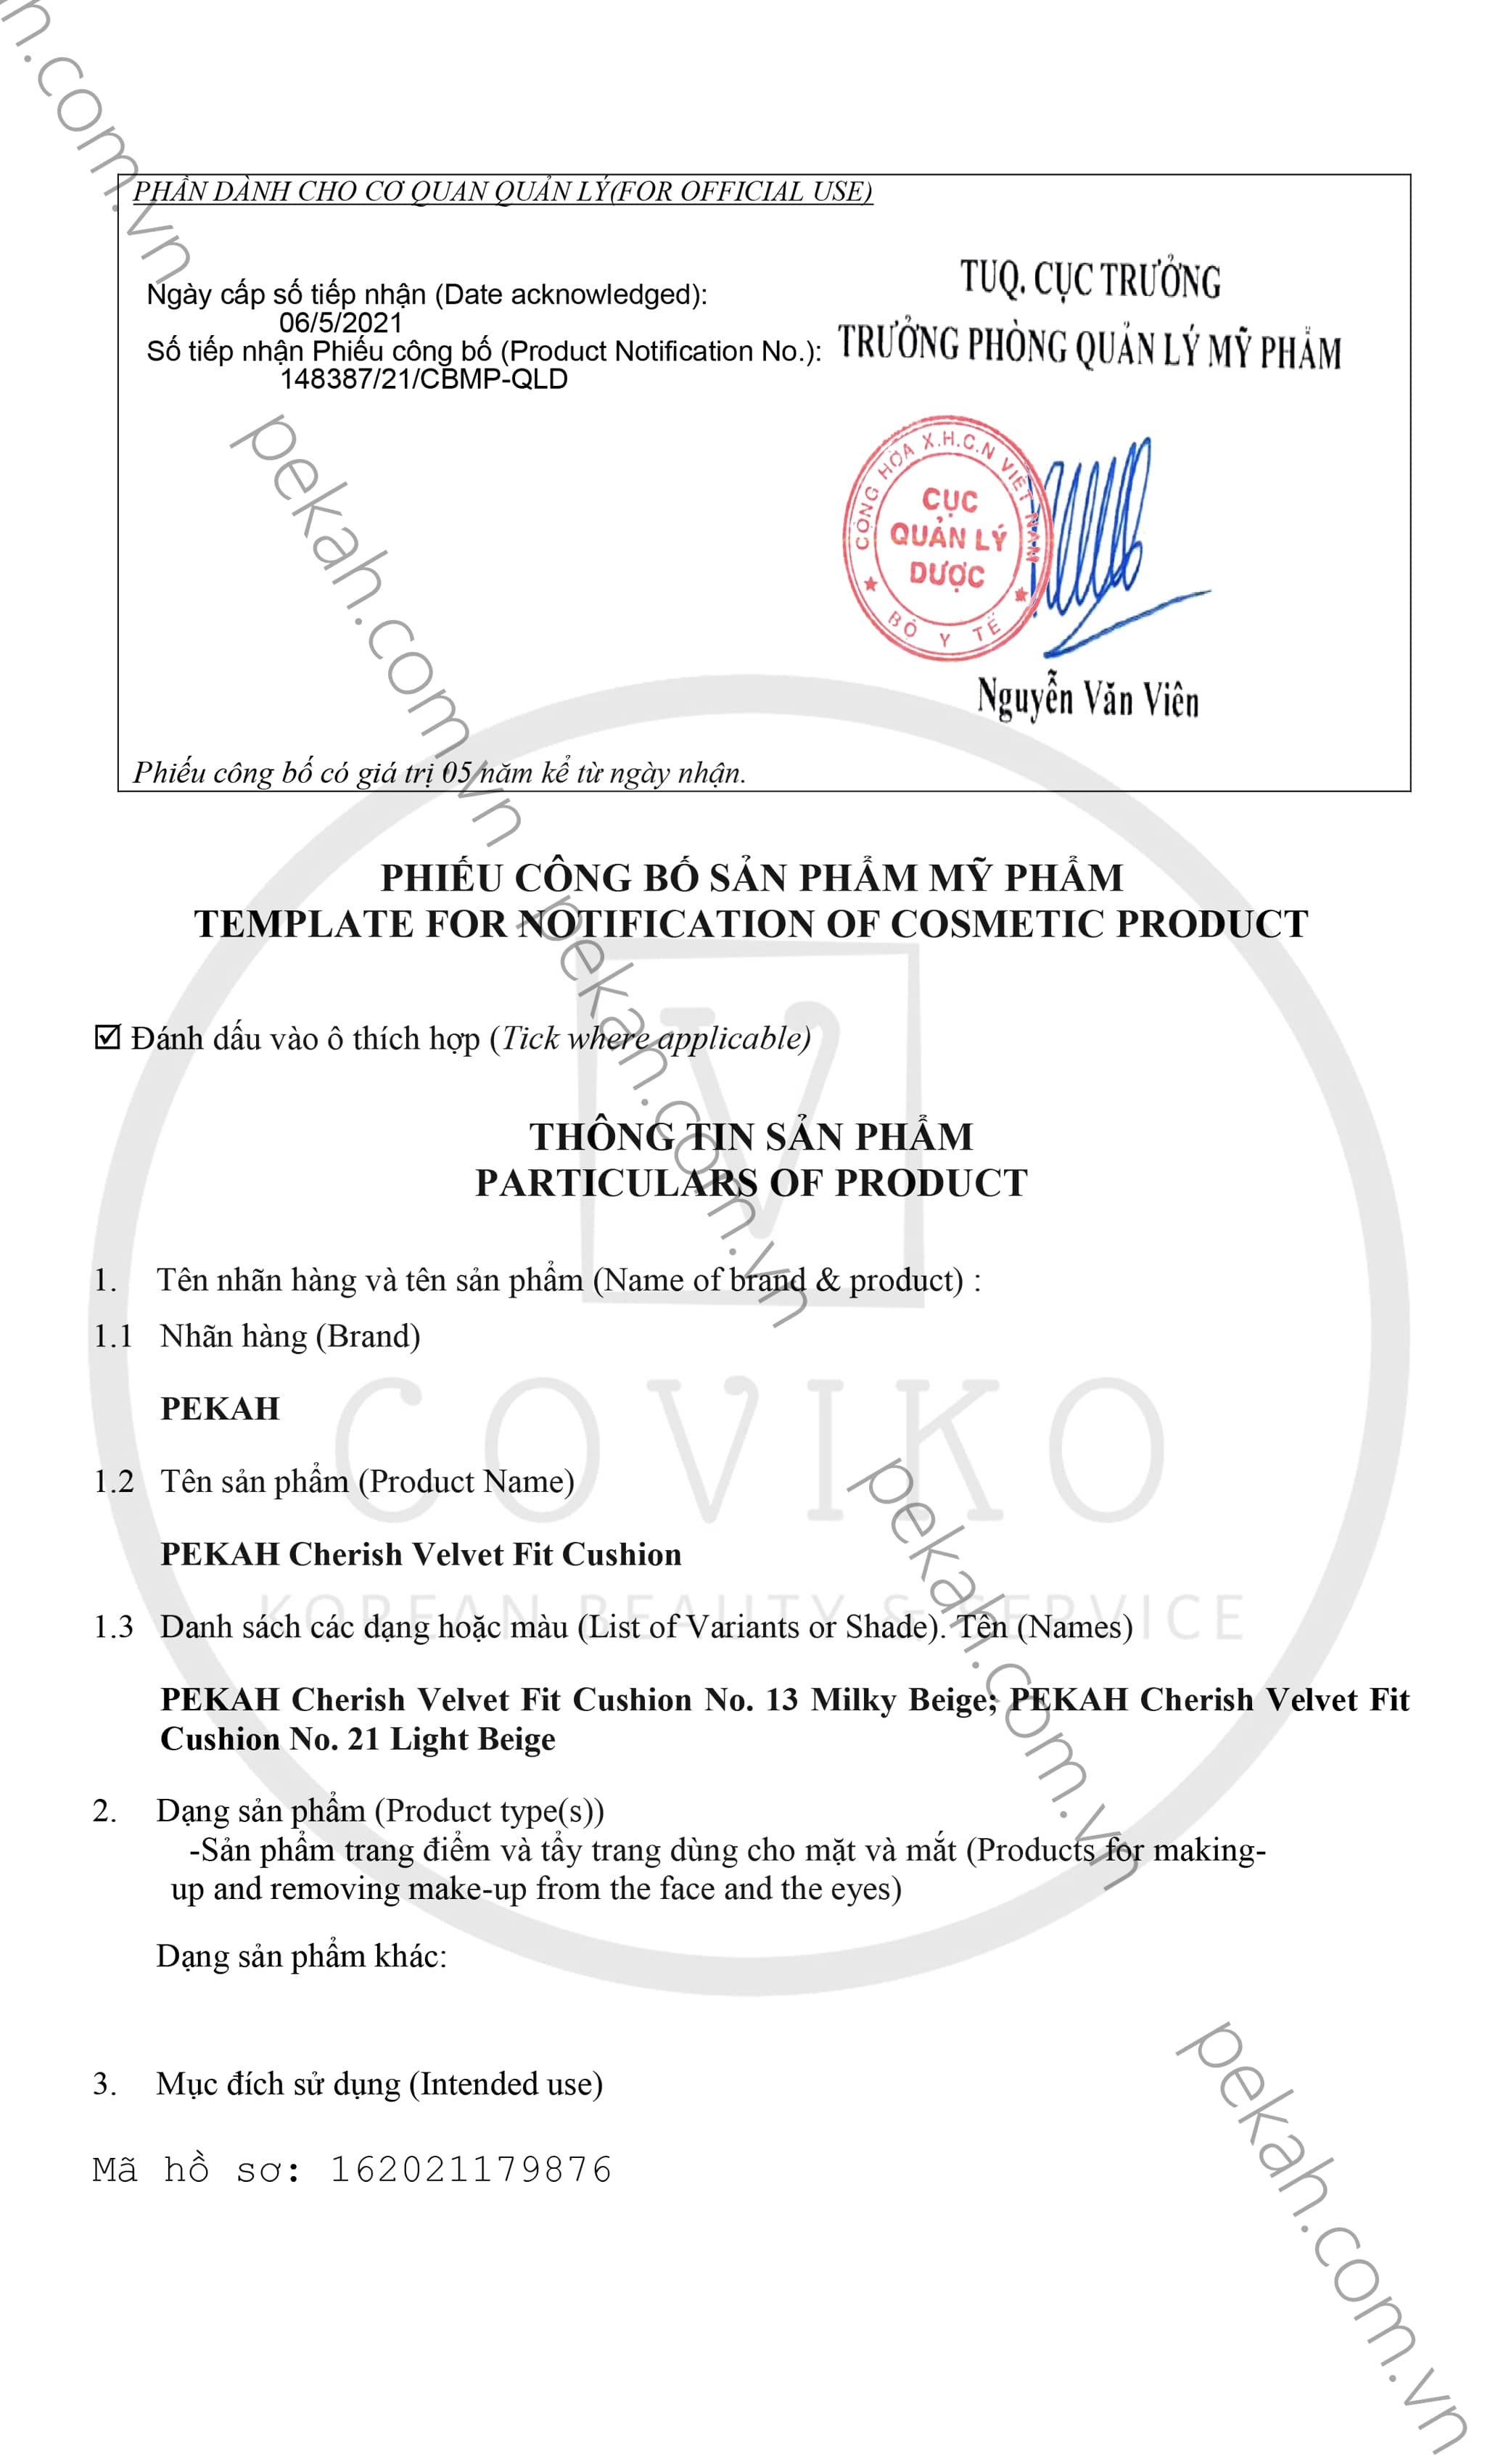 PHẤN NƯỚC CHE KHUYẾT ĐIỂM LÀM MỊN DA PEKAH - PEKAH CHERISH VELVET FIT CUSHION